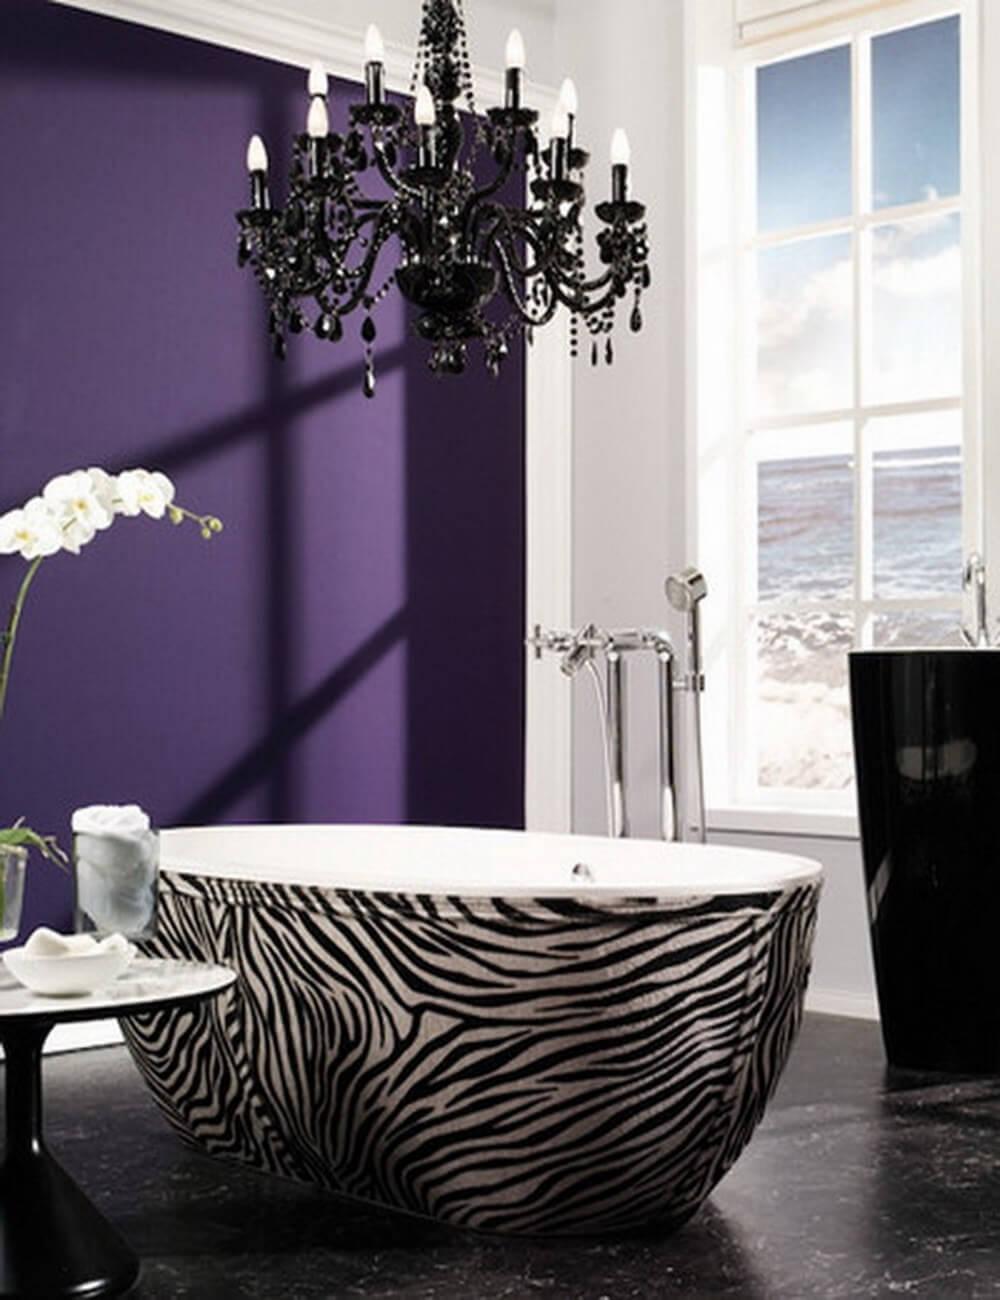 The Most Amazing Bathtubs in the World Zebra Print Interior Design Ideas 41